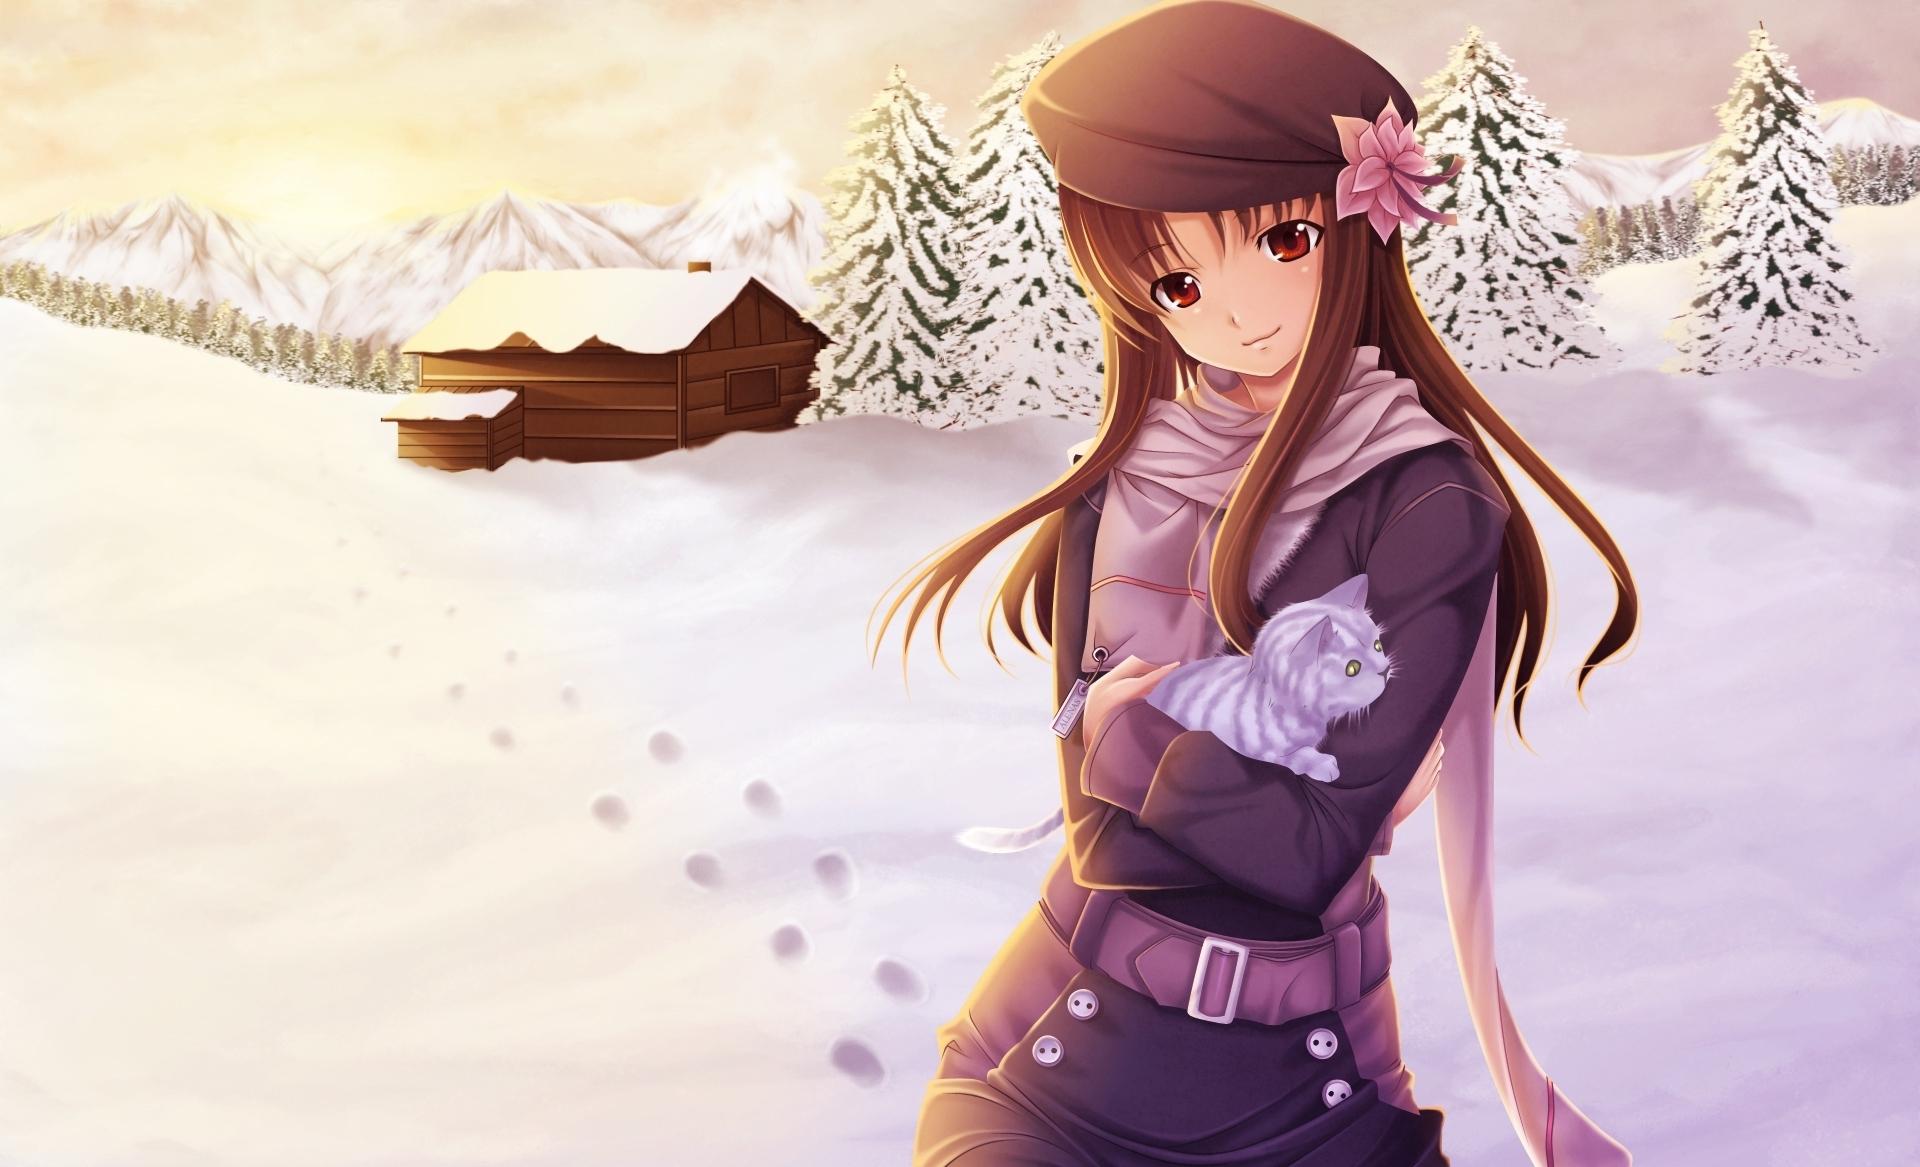 hinh nen anime girl dang yeu 32